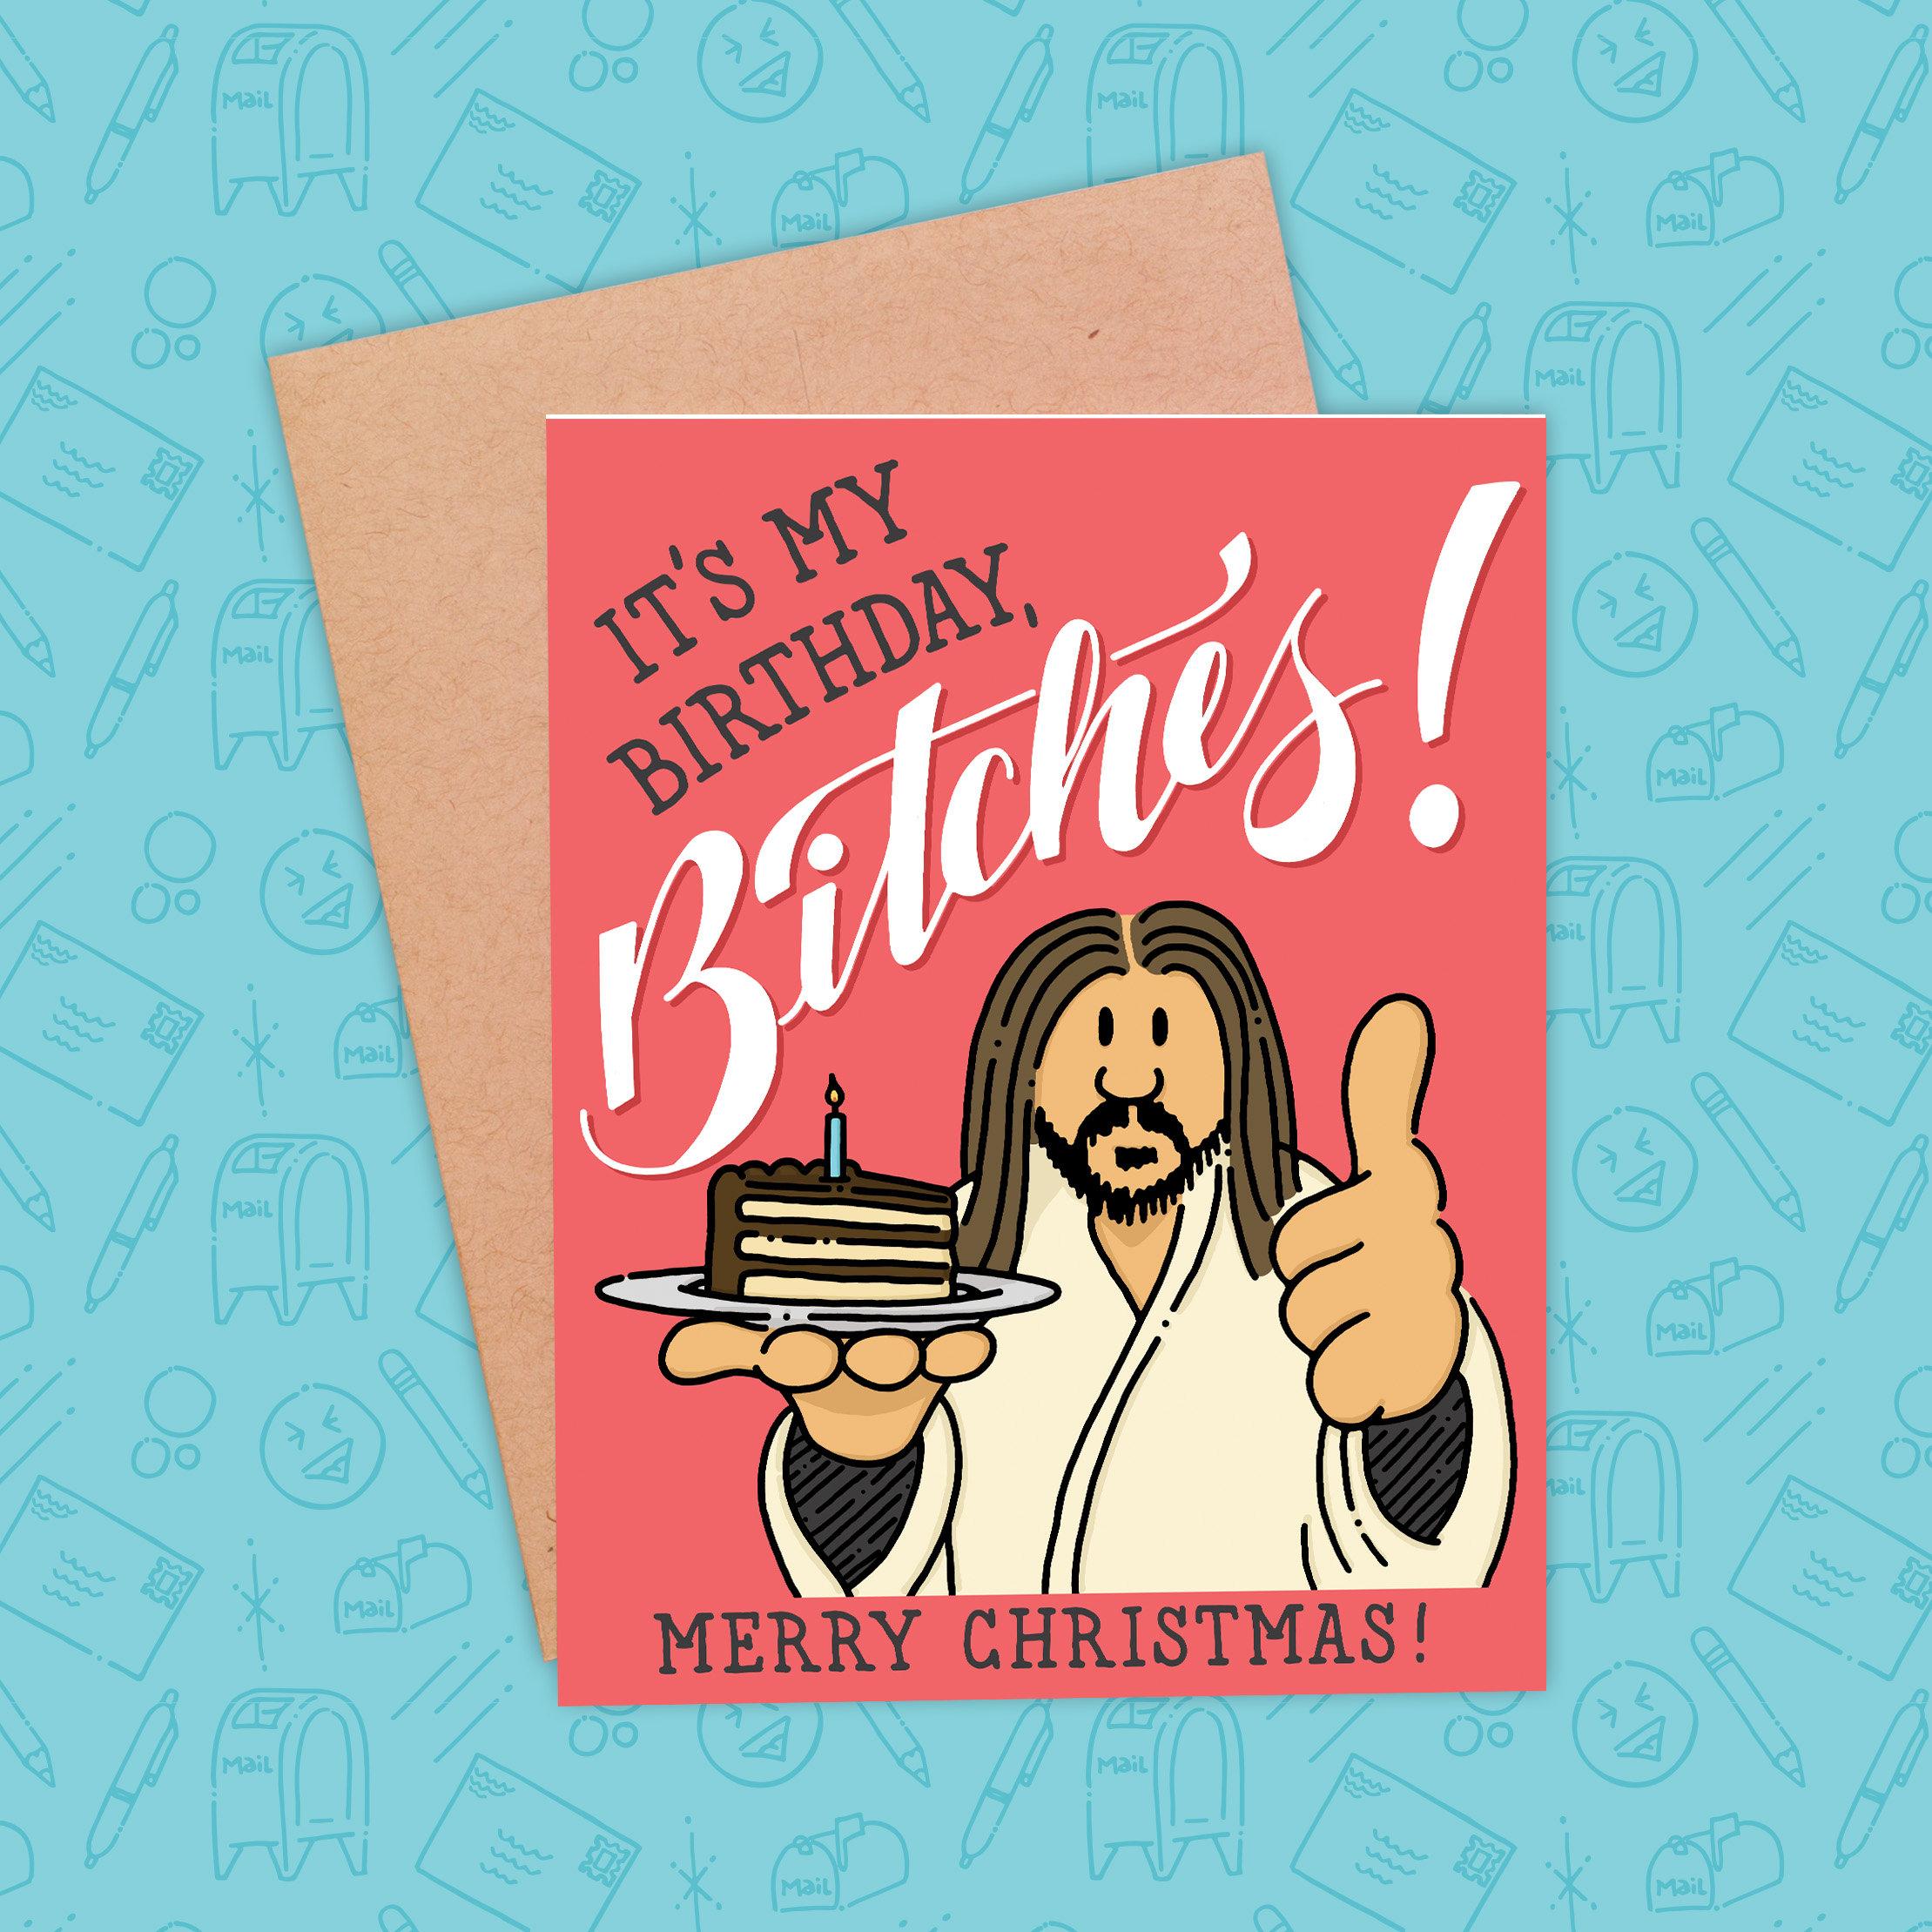 Happy Birthday Jesus Card Funny Christmas Card It's My